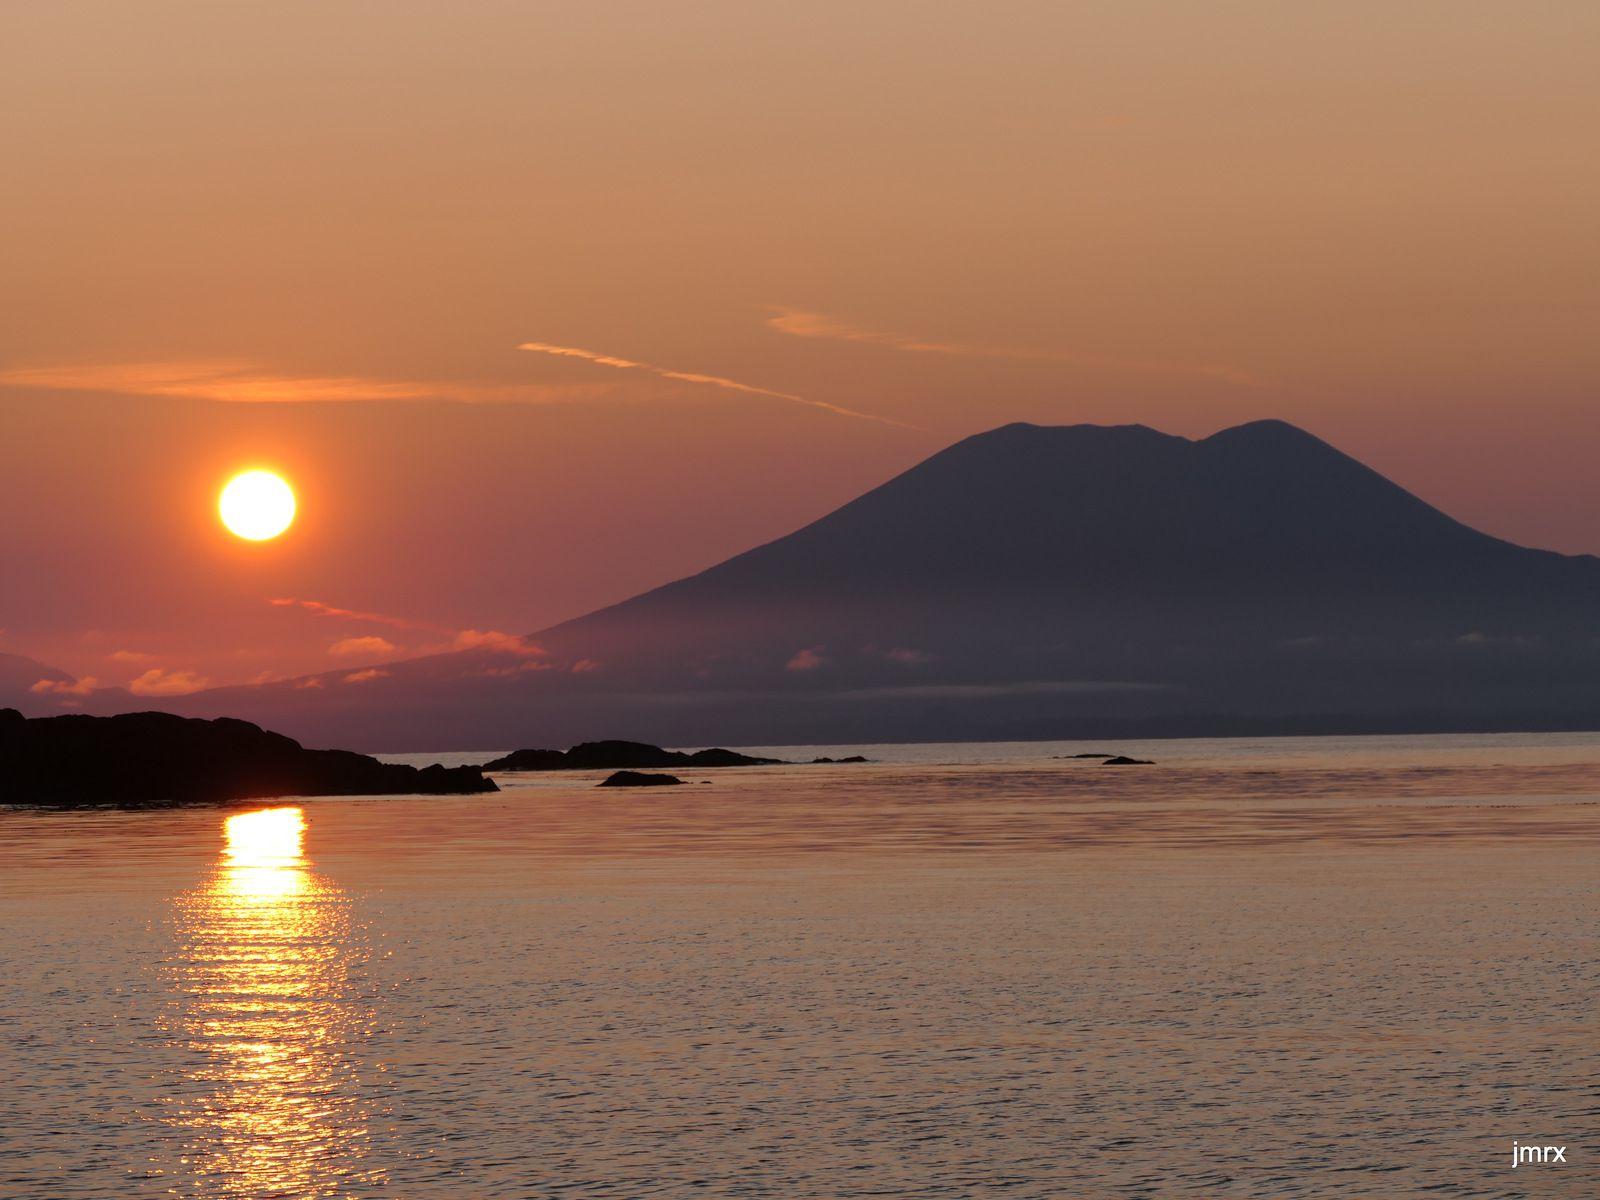 Le Mont Edgecumbe domine le Baie de Sika